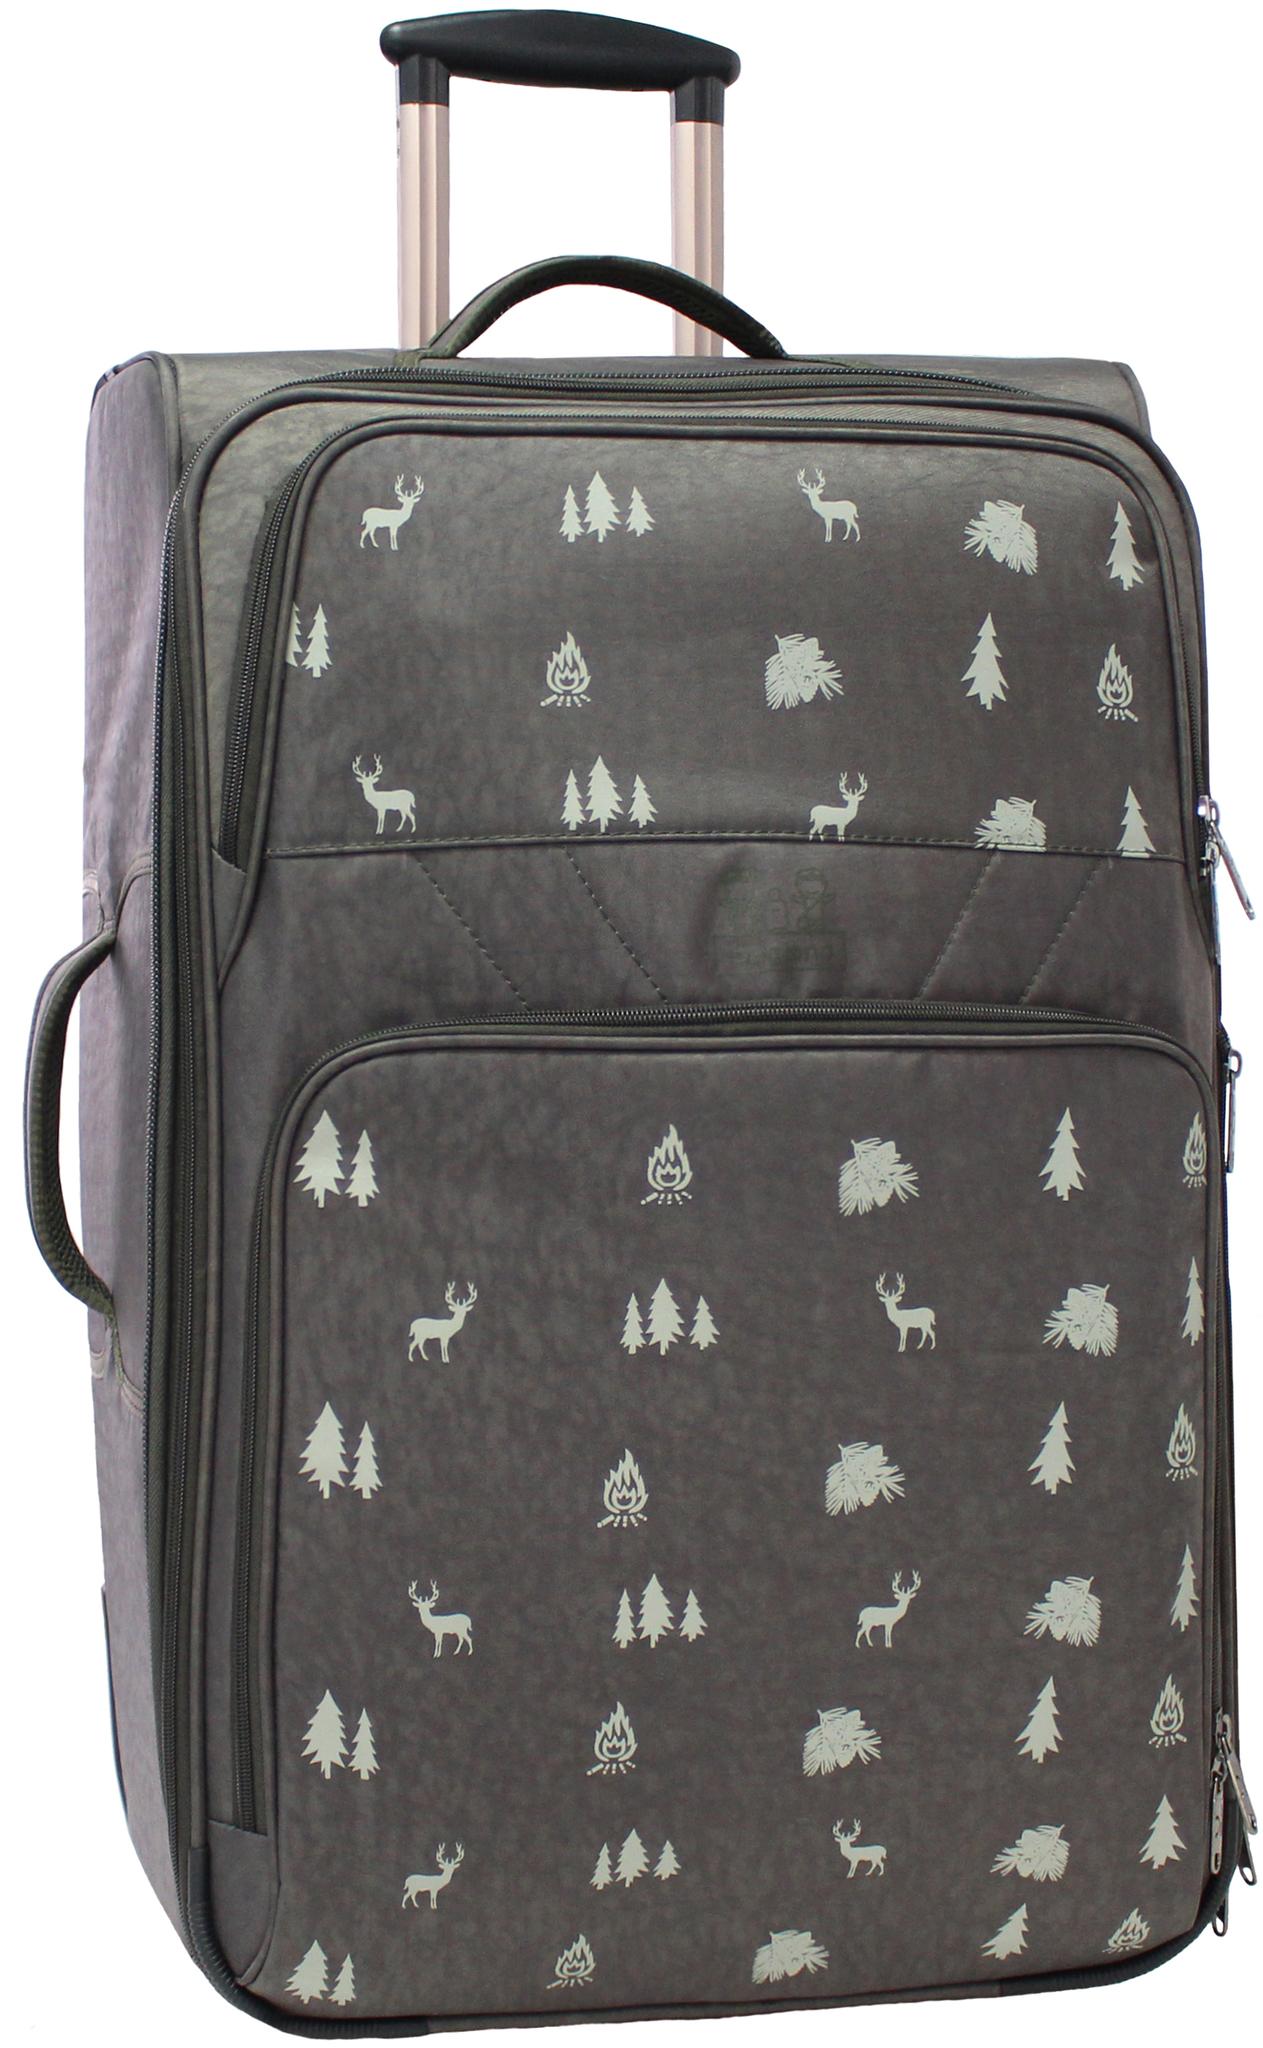 Дорожные чемоданы Чемодан Bagland Леон большой 70 л. 327 хакі/олені (003767027) IMG_5421.JPG